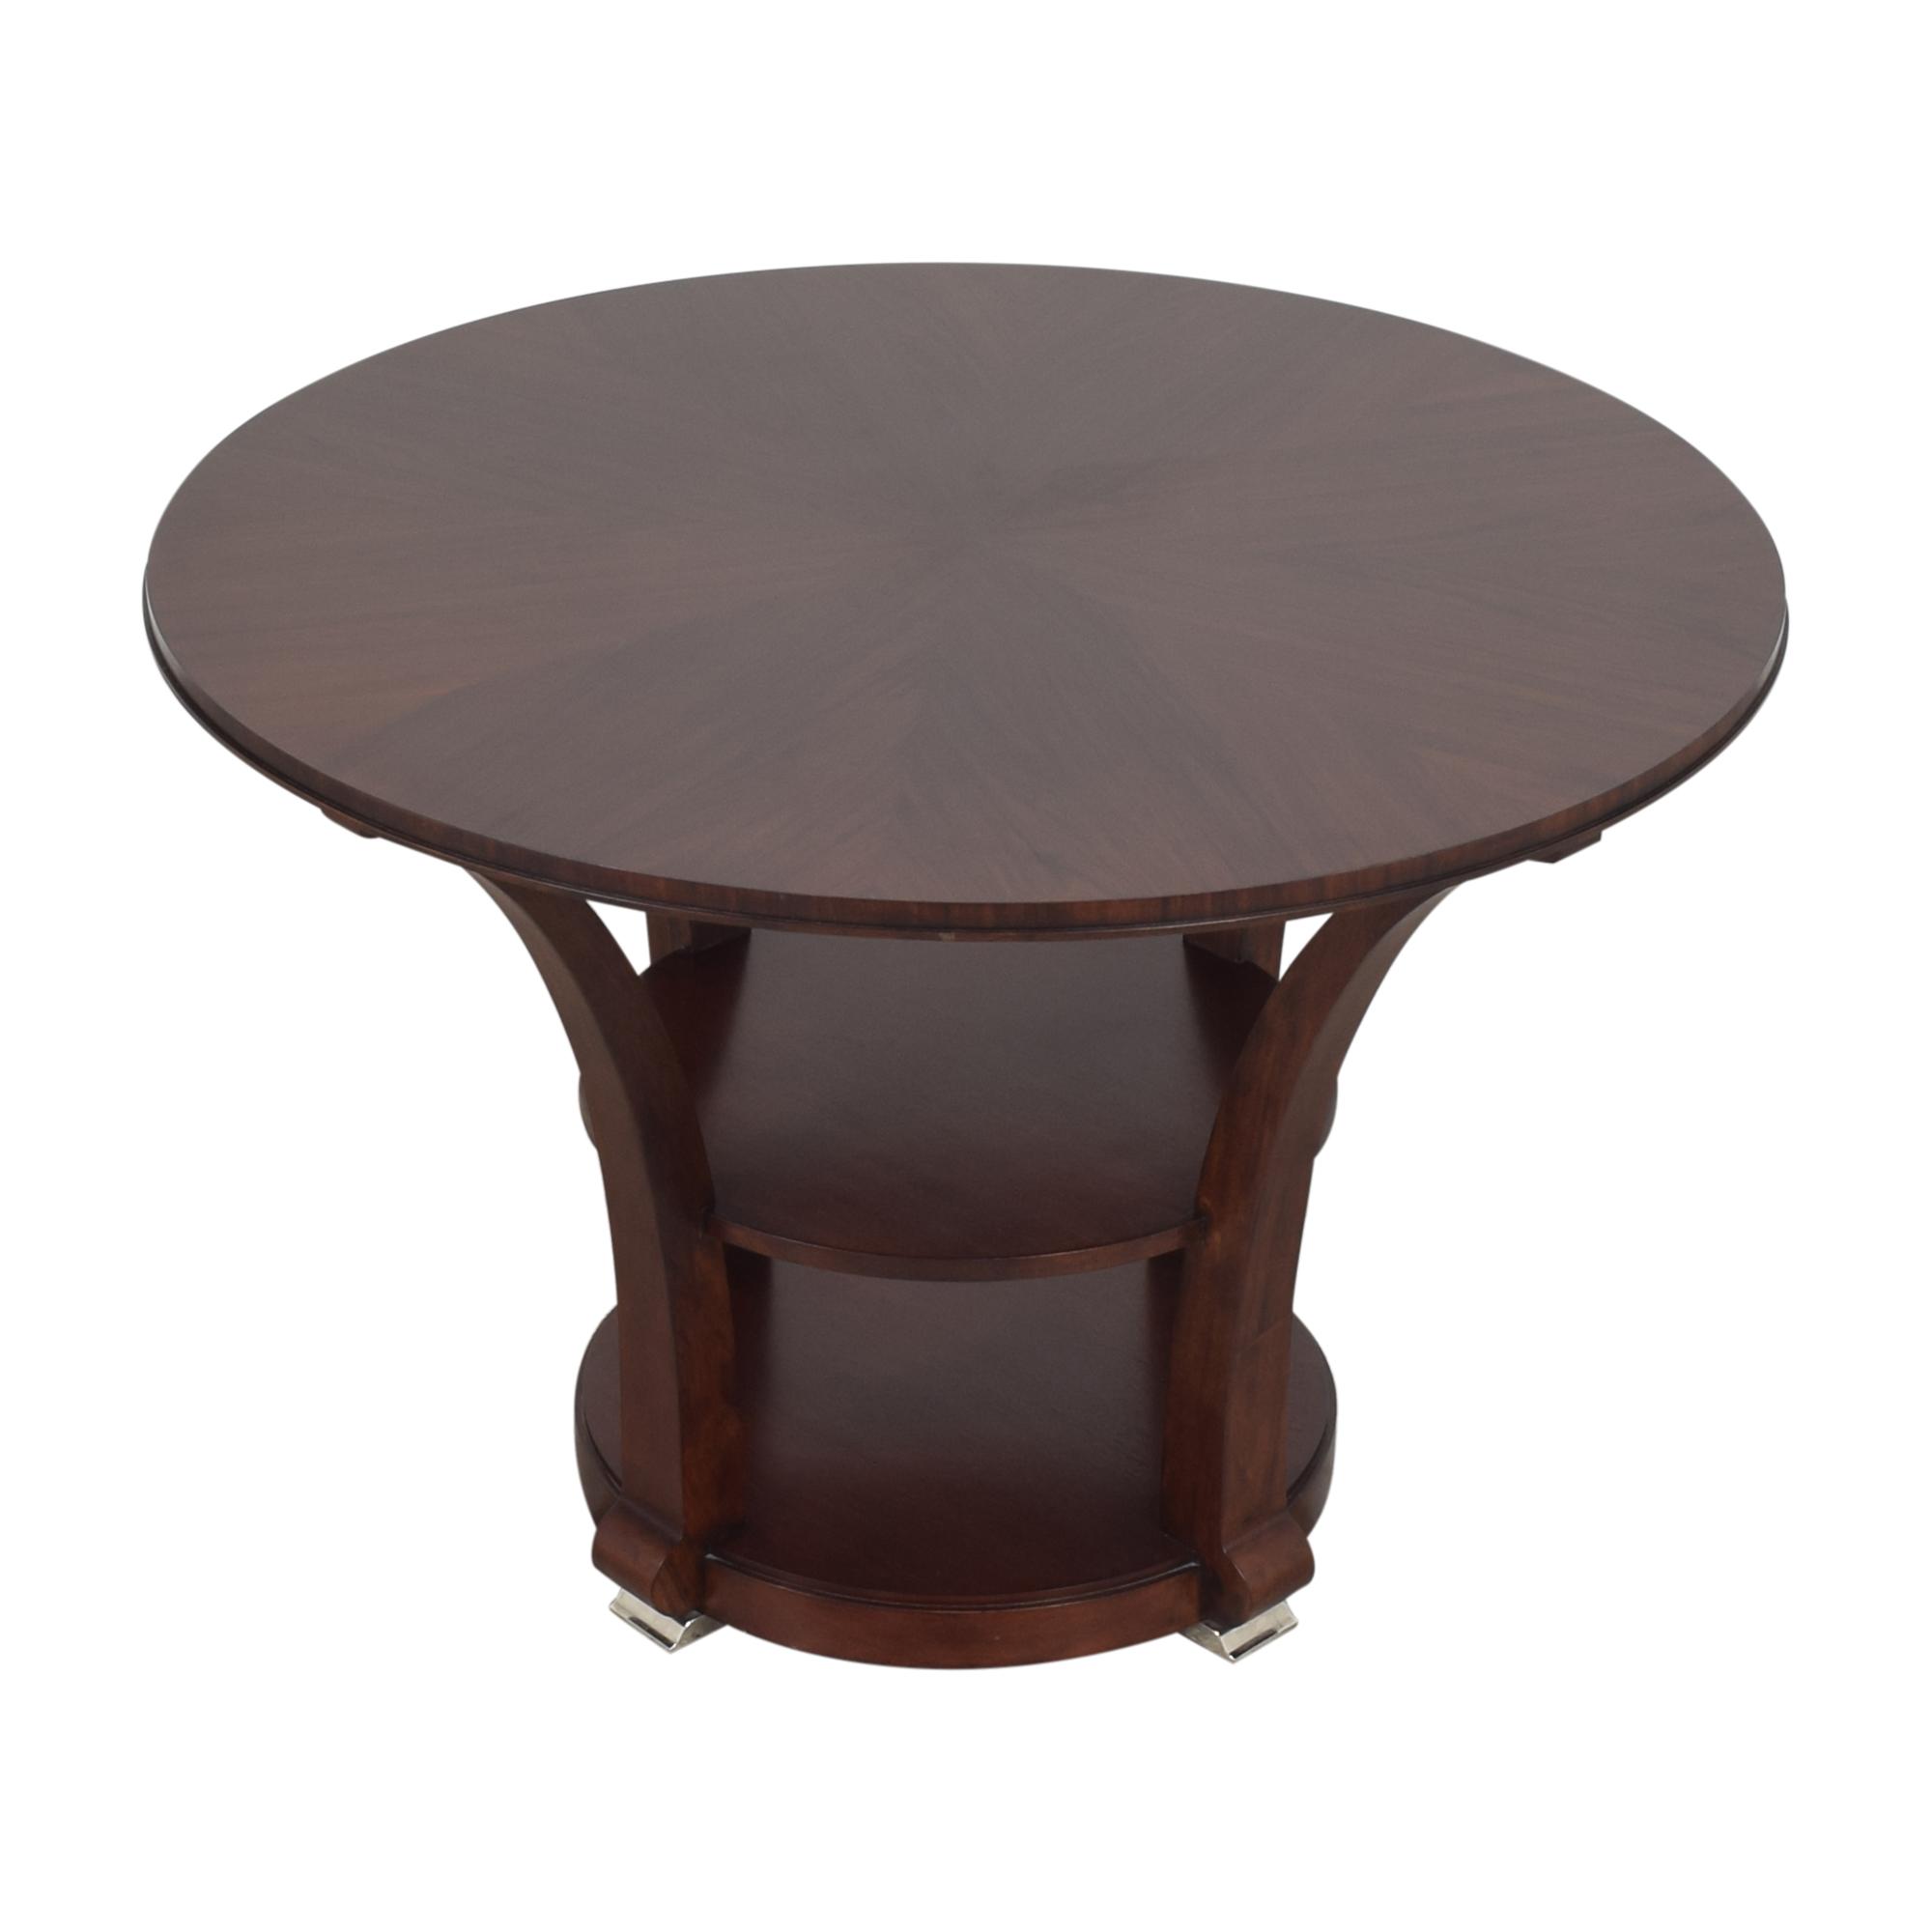 Hekman Furniture Hekman Metropolis Dining Table nj